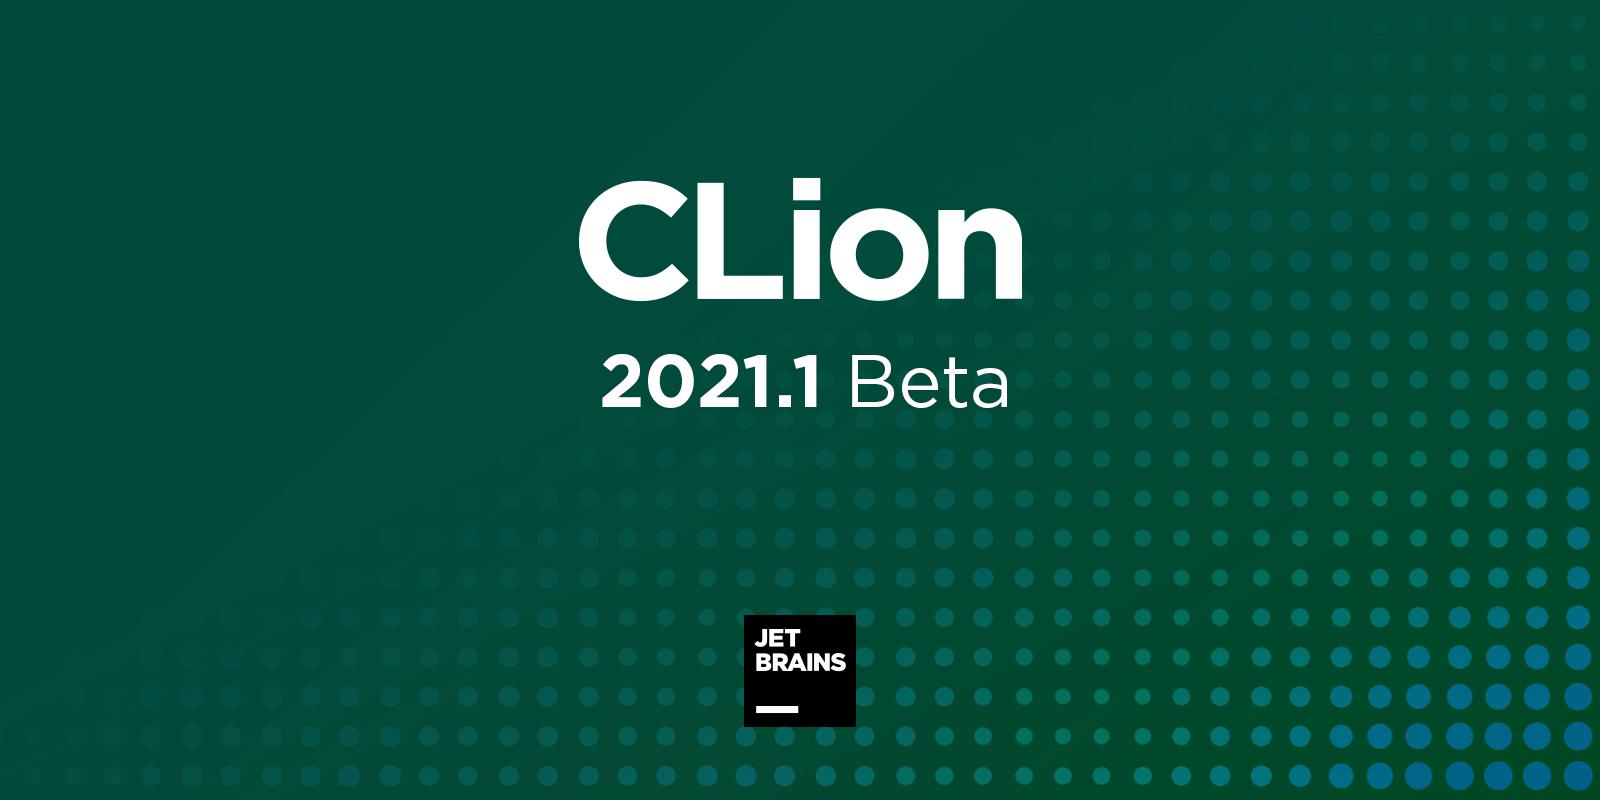 CLion Beta